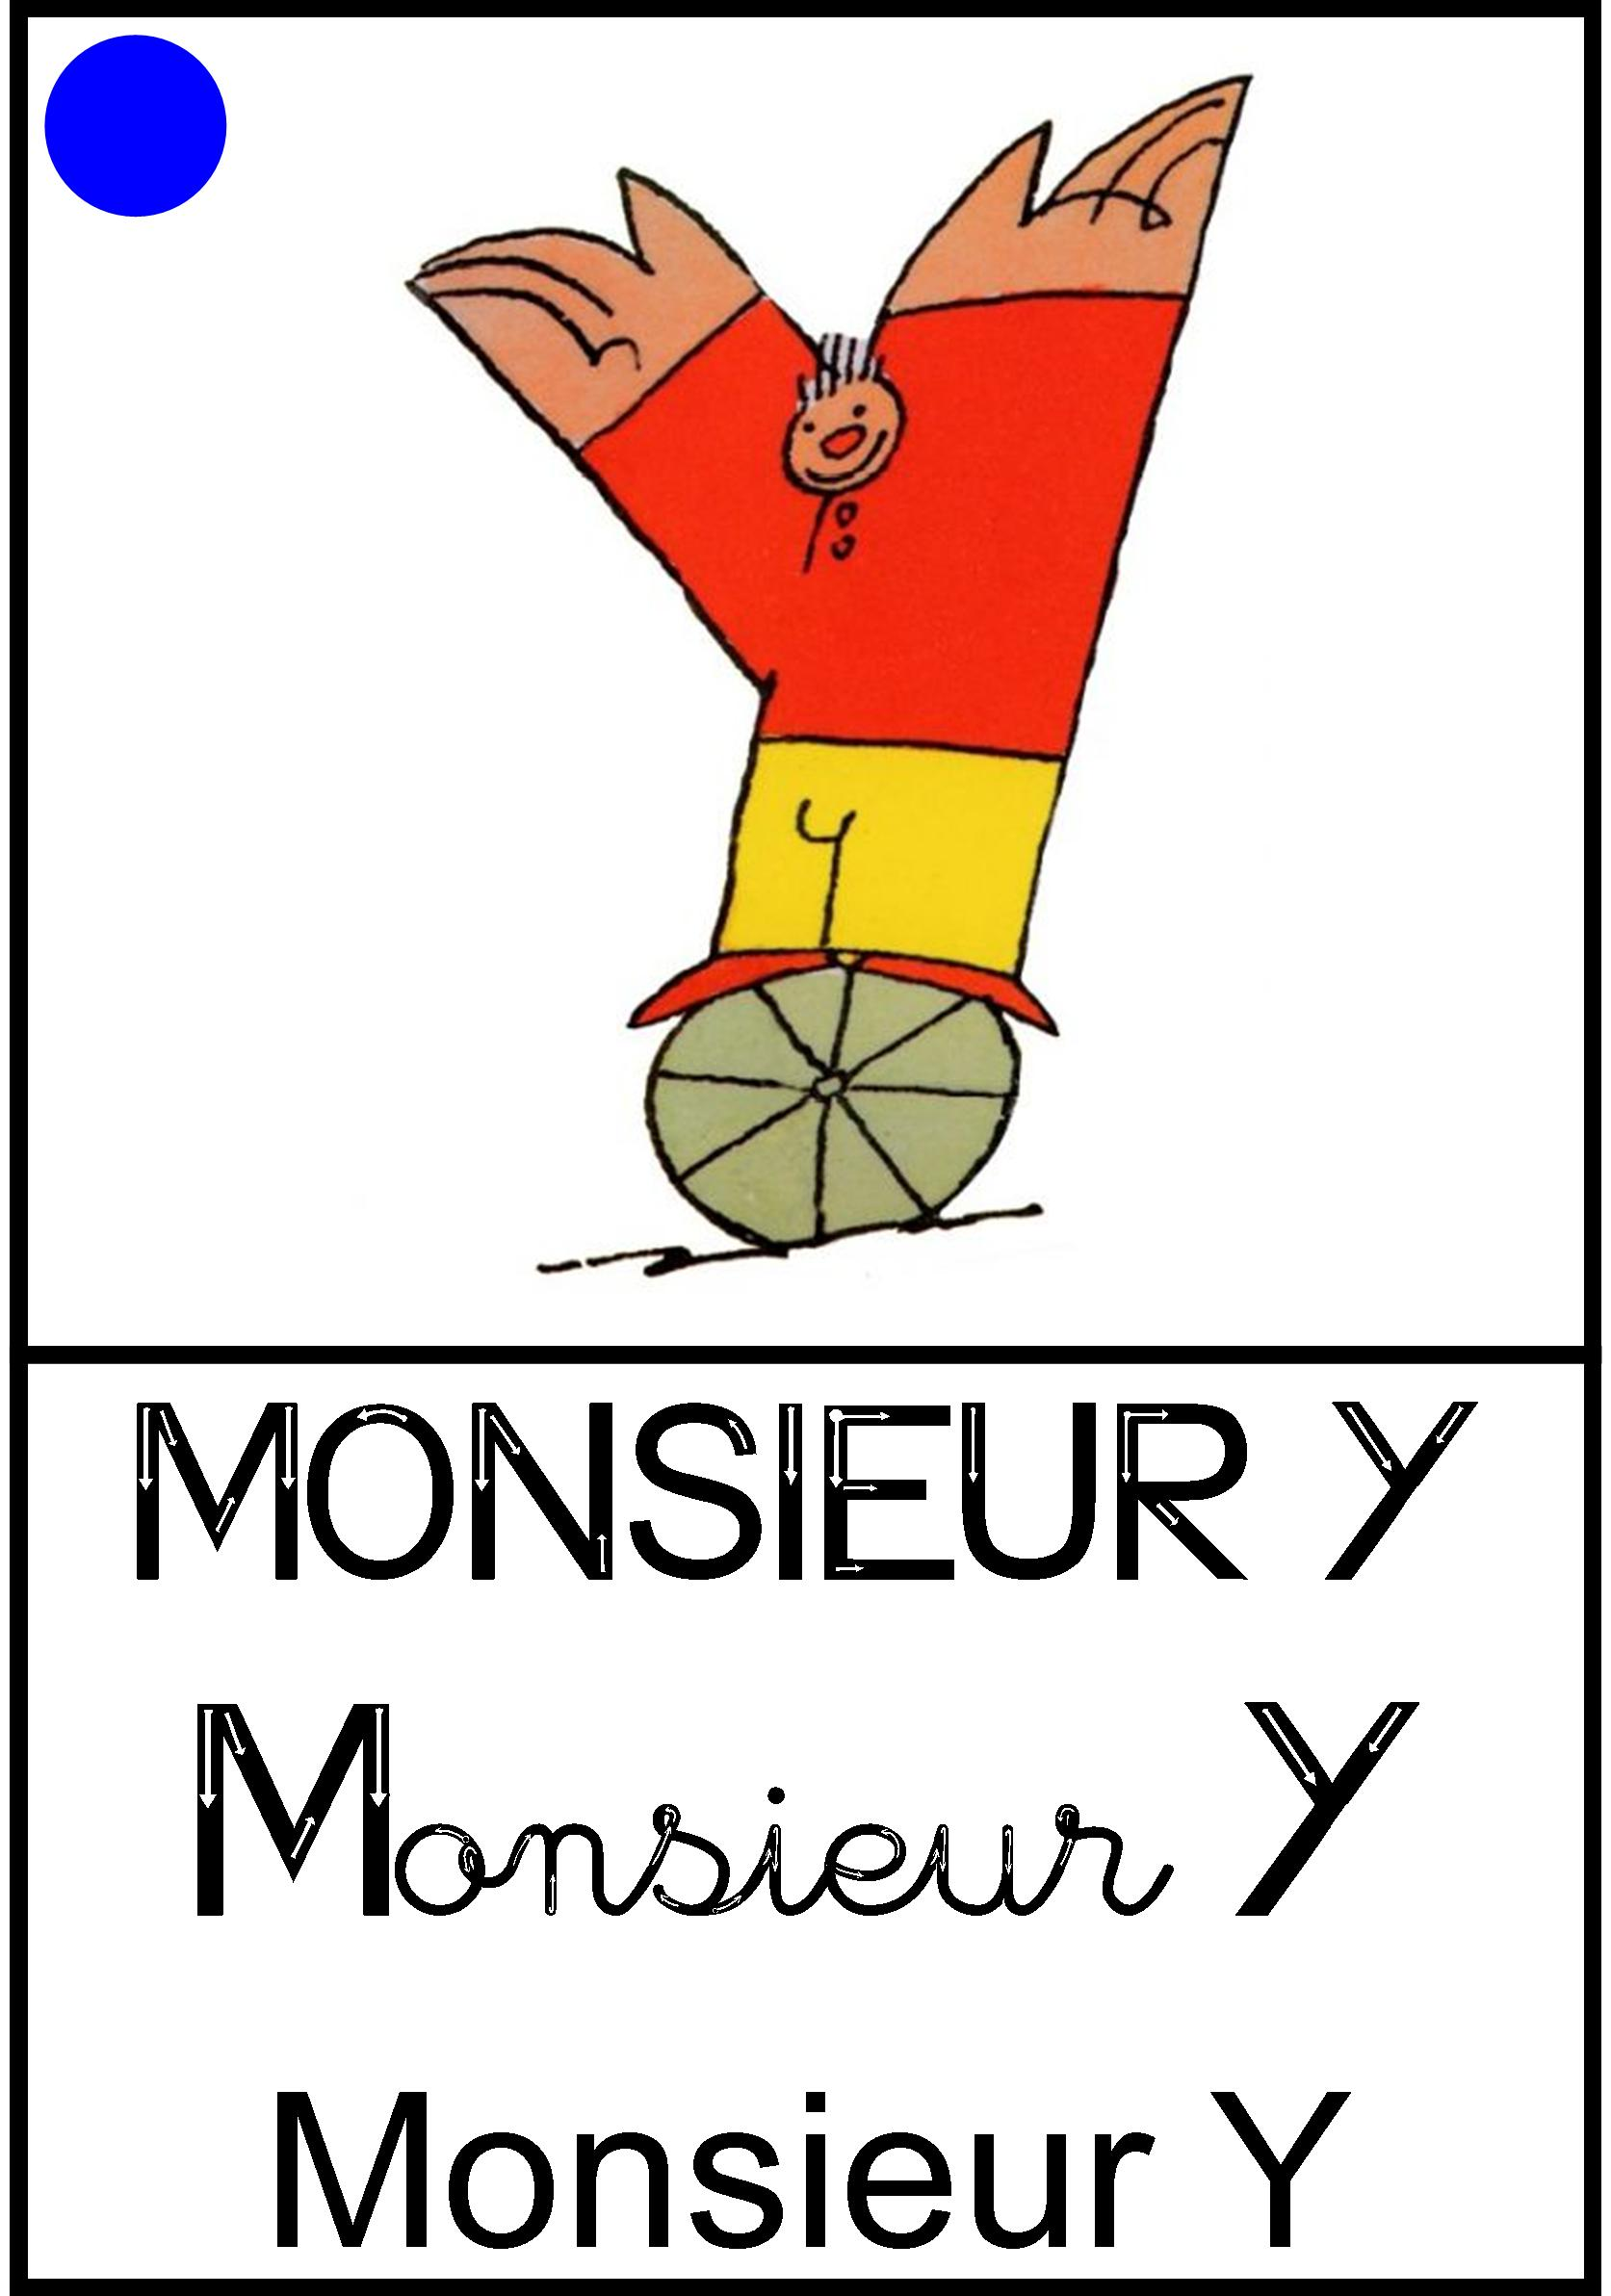 Affichage Monsieur Y